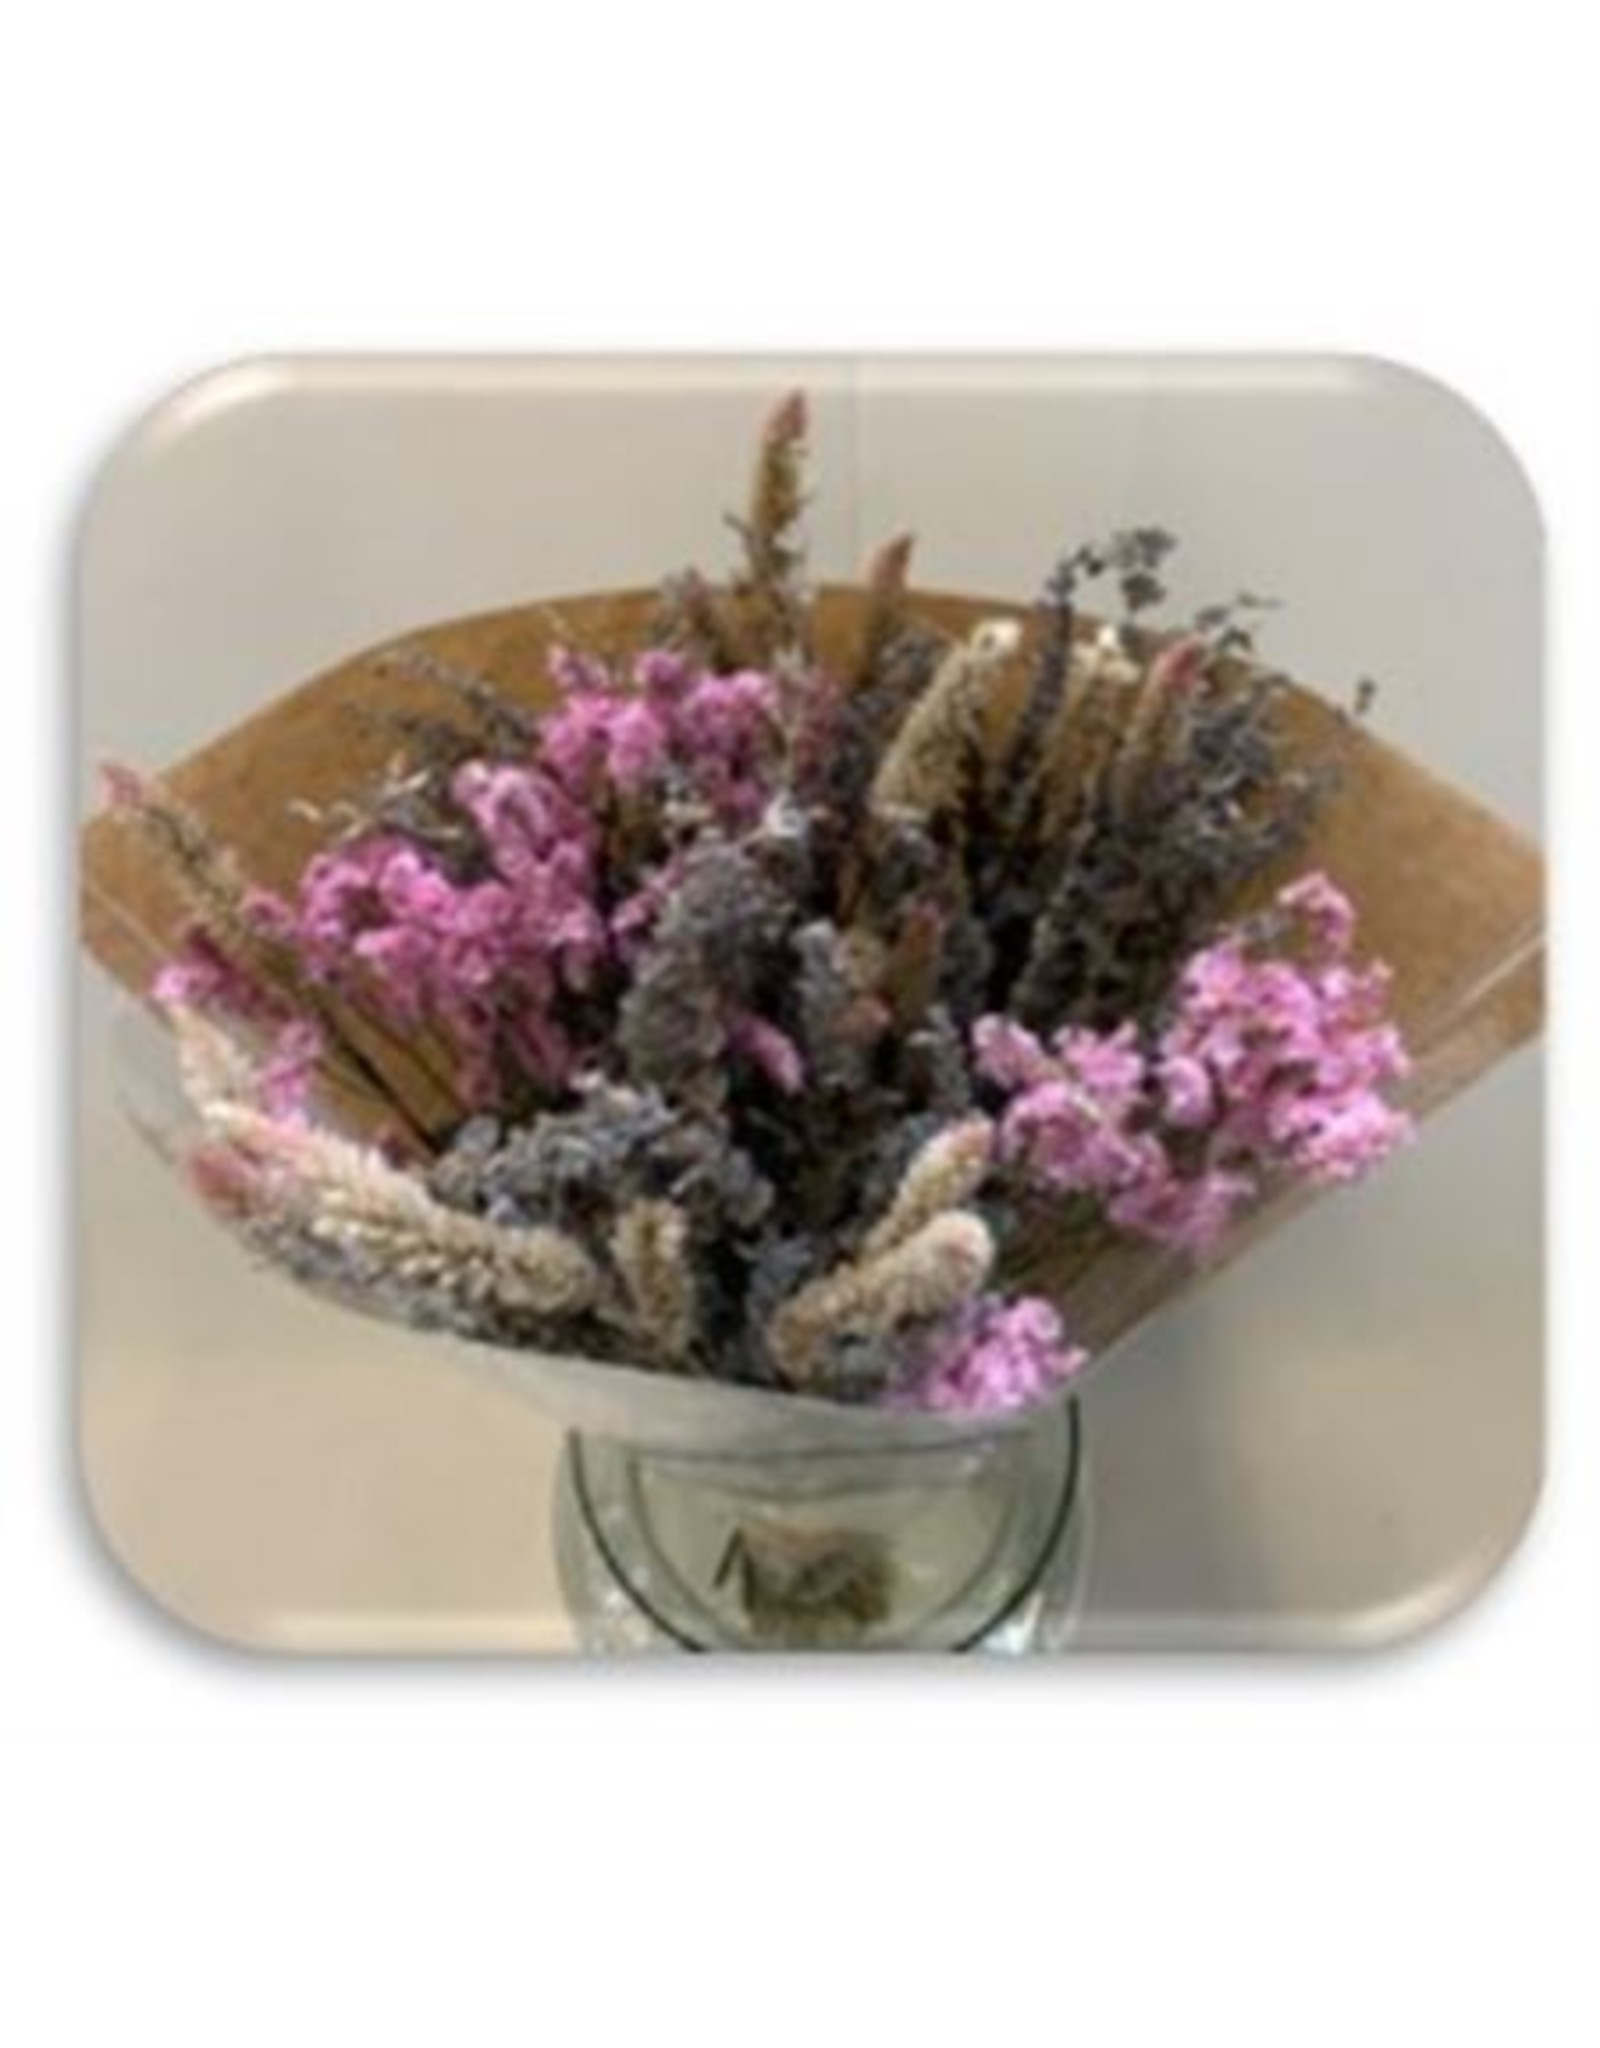 HD strauß Lavendel strauß1 Slv ↑50.0 (x 15)